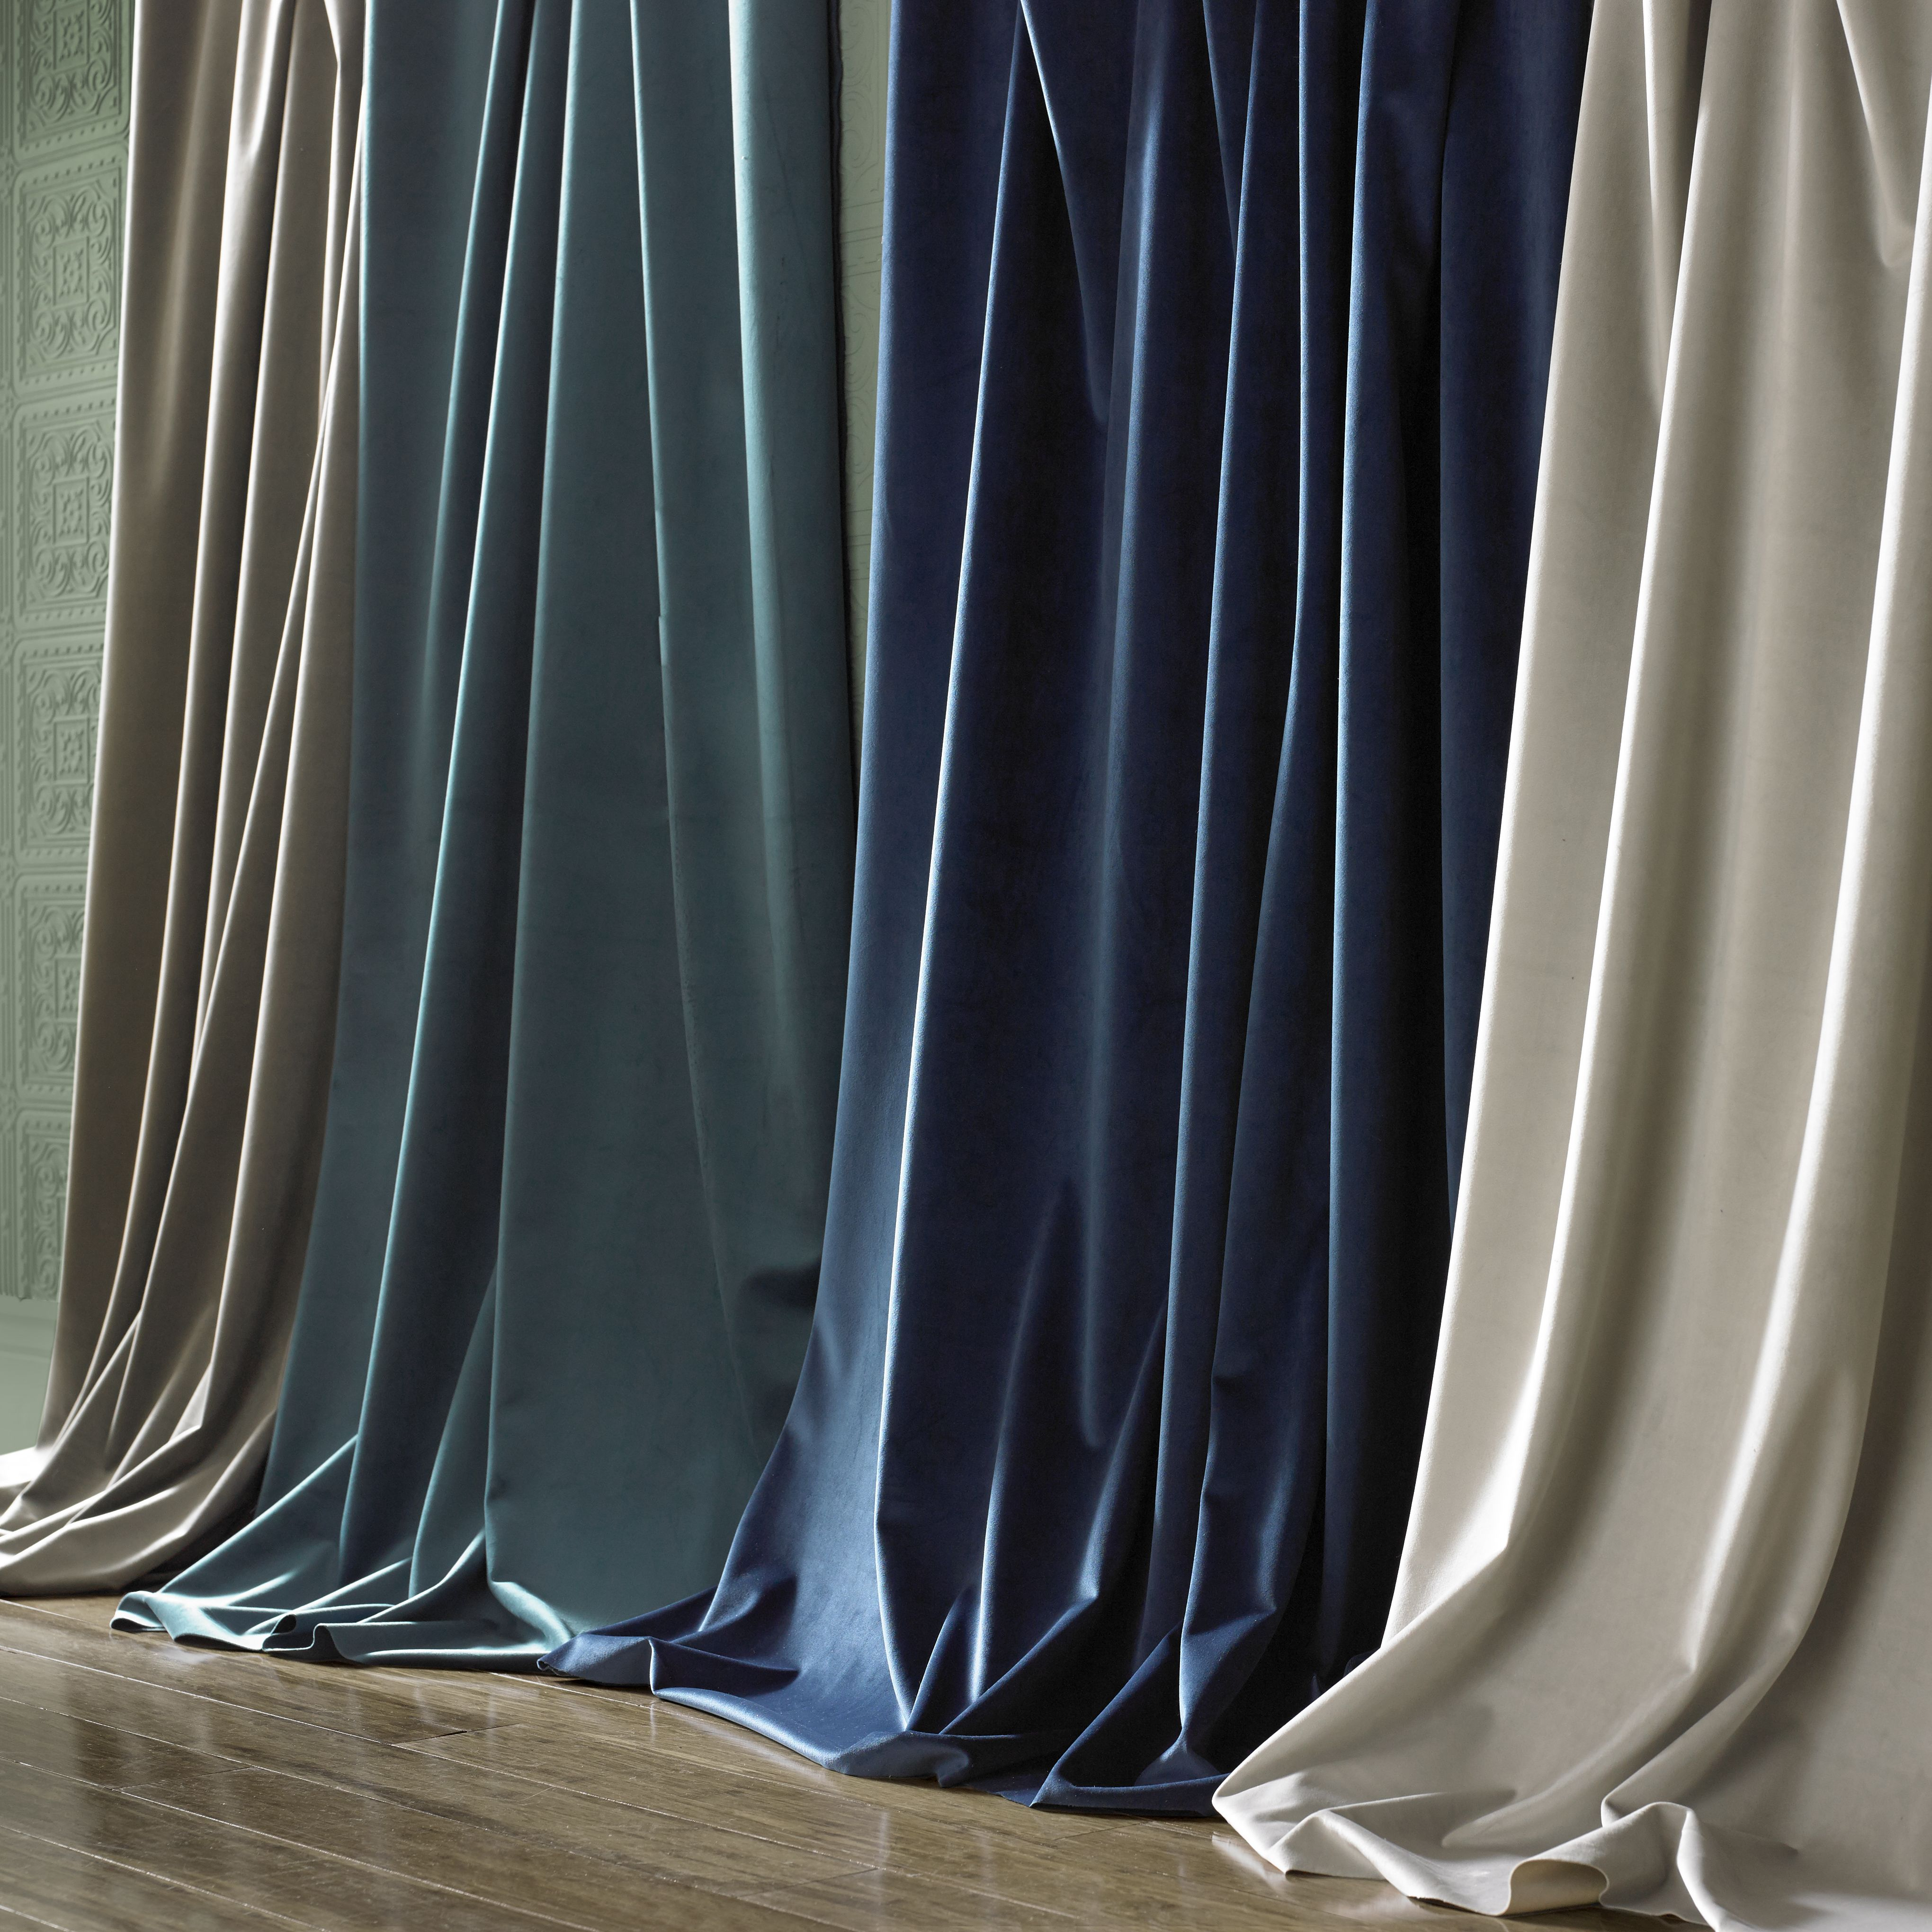 #CurtainDesign #Curtains #CurtainIdeas #Blues #Blinds #Aqua #Blue #Calm #Fresh #DomusLumina